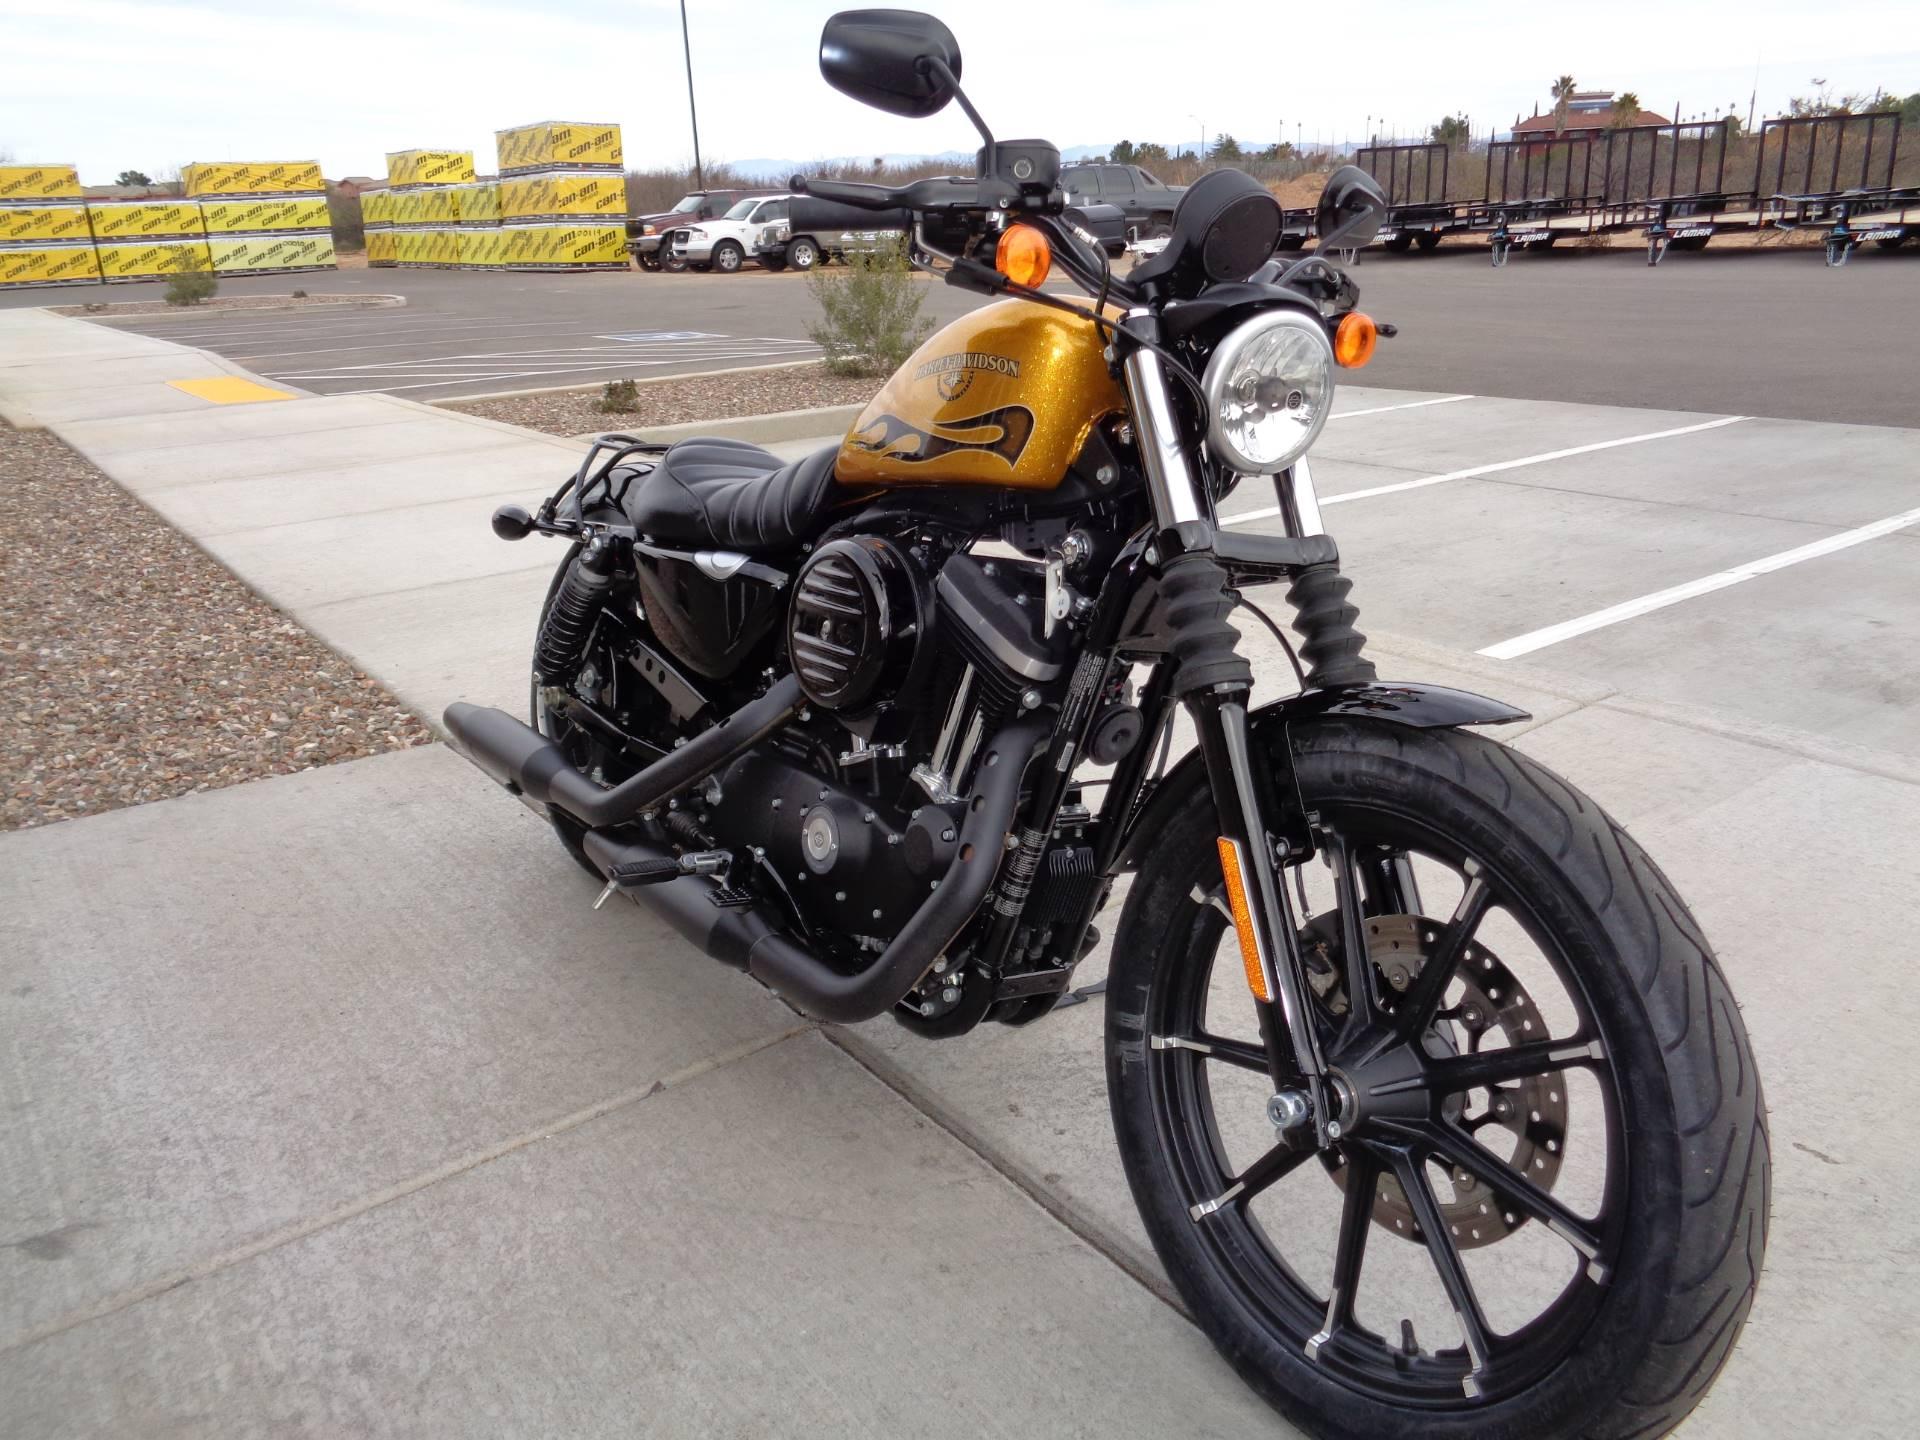 2016 Harley-Davidson Iron 883 4